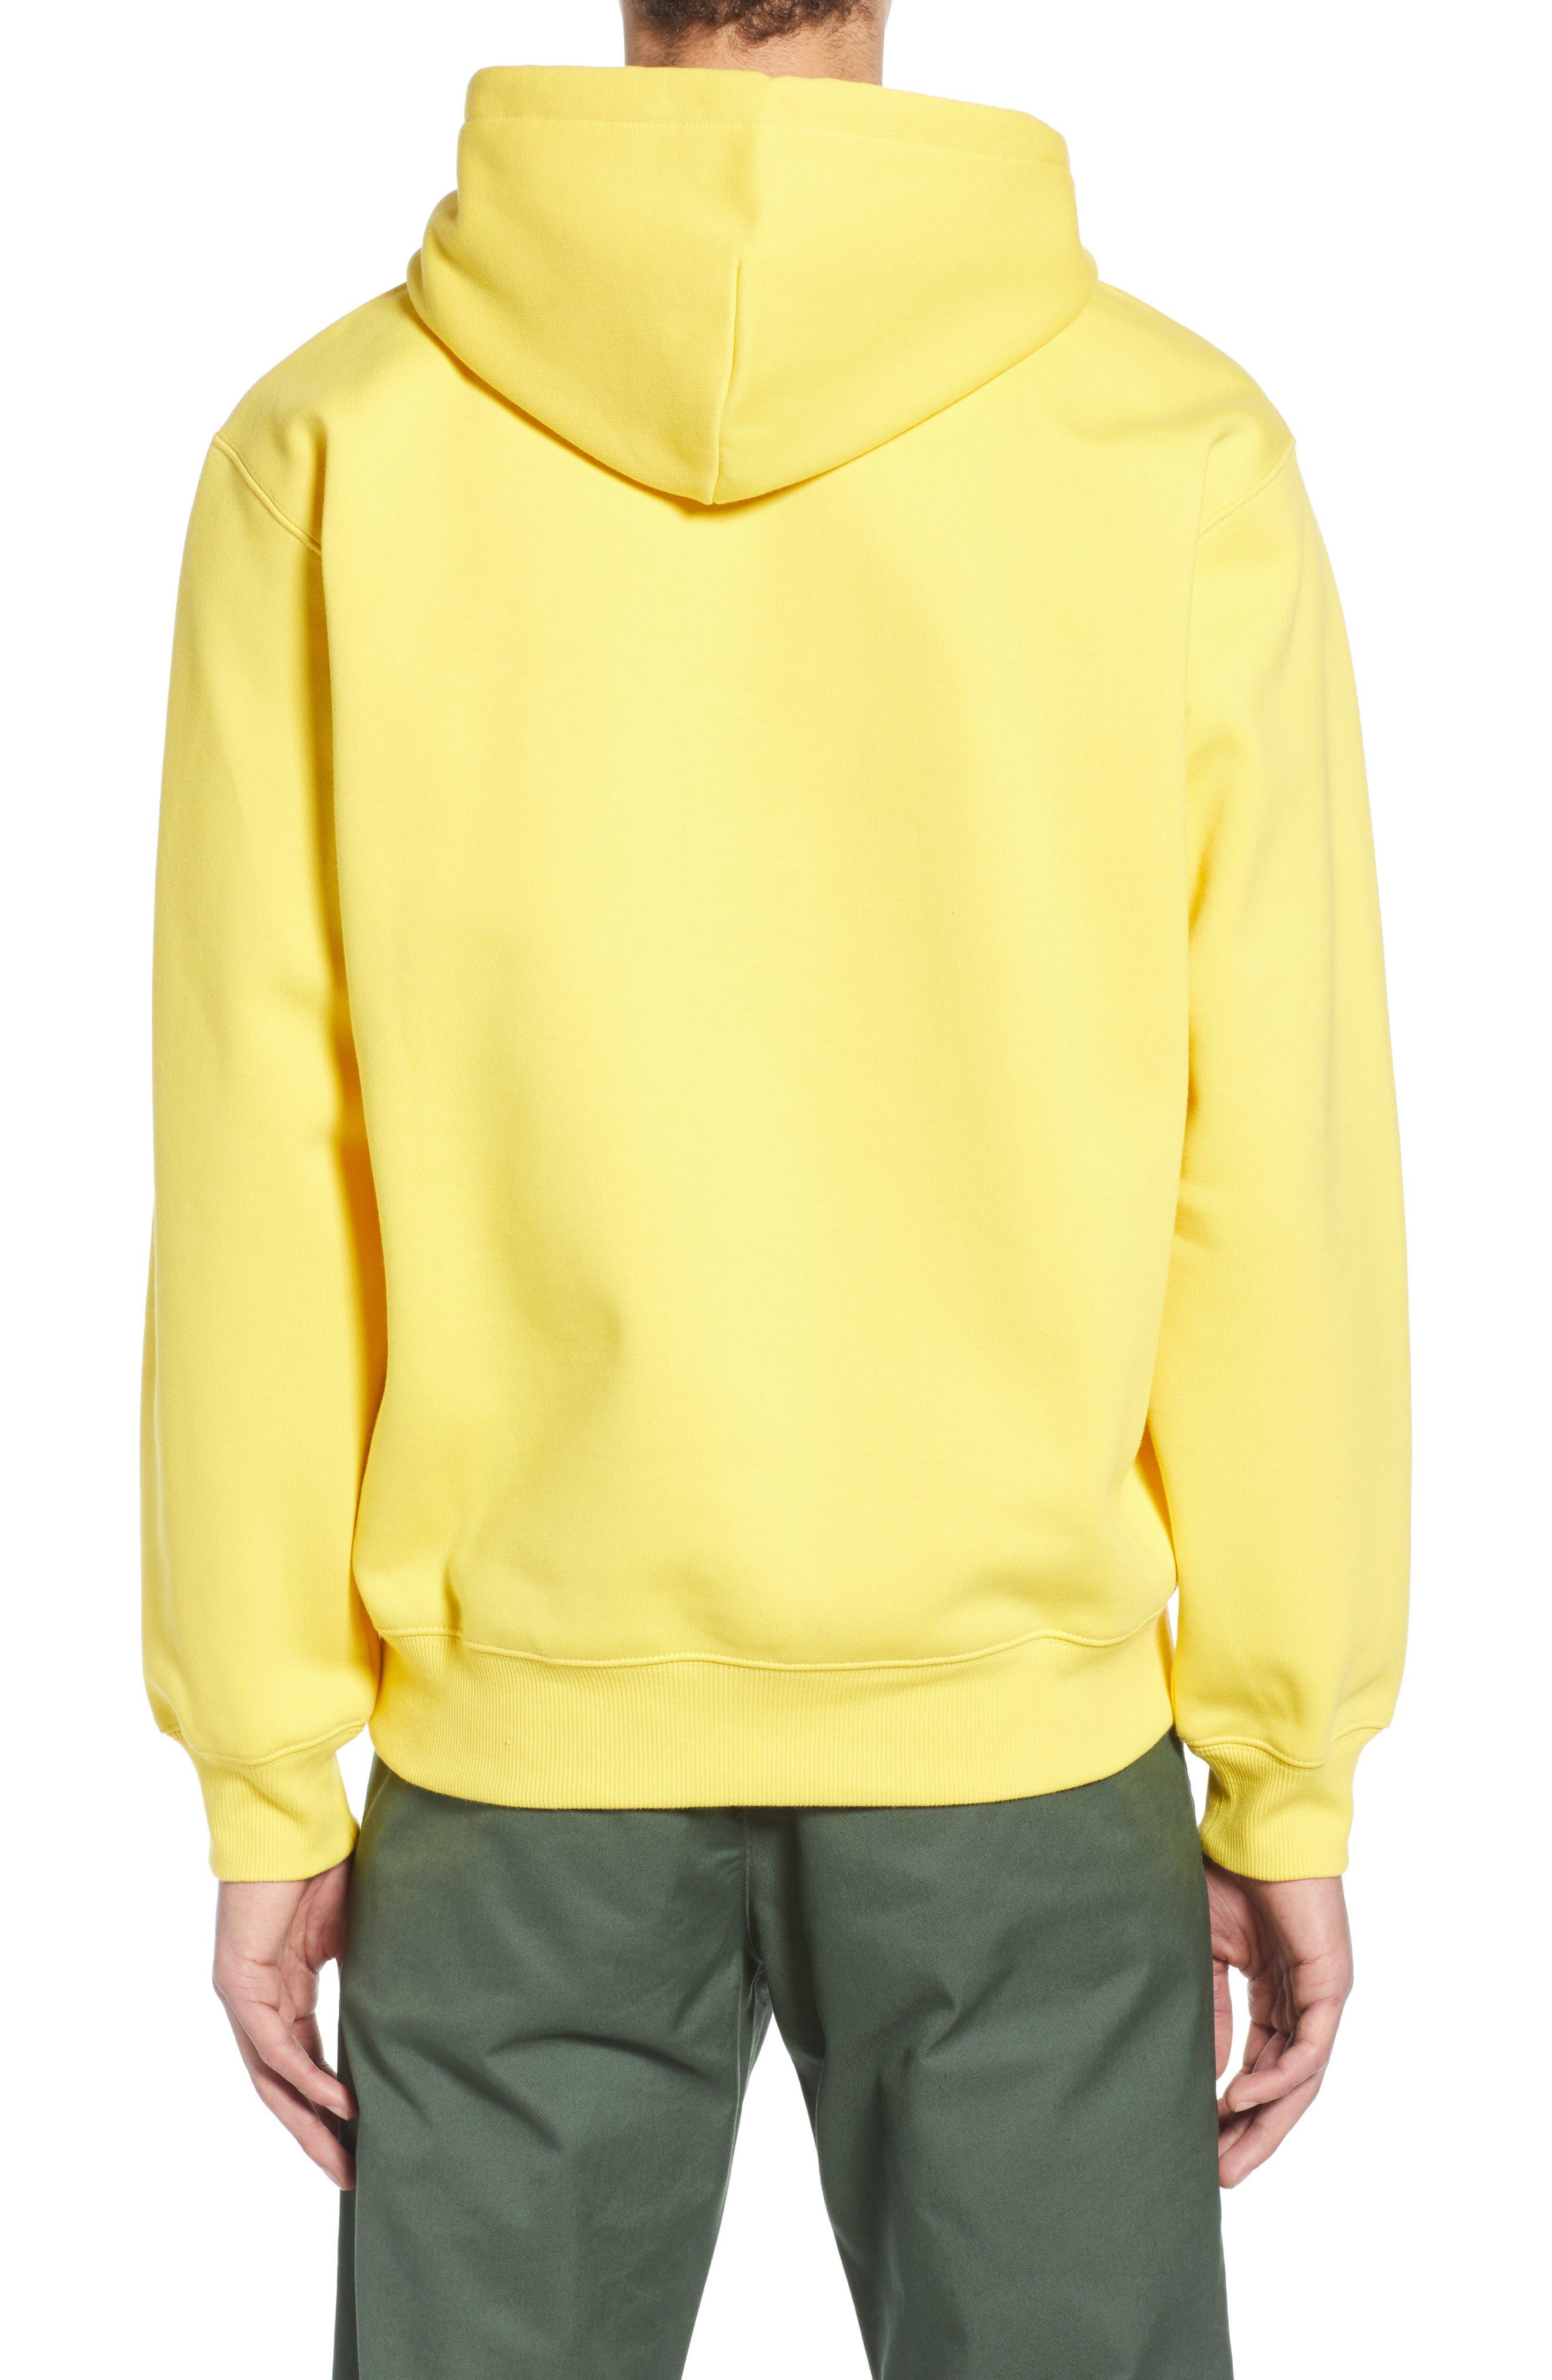 CARHARTT WORK IN PROGRESS, Hooded Sweatshirt, Alternate thumbnail 2, color, PRIMULA / BLACK